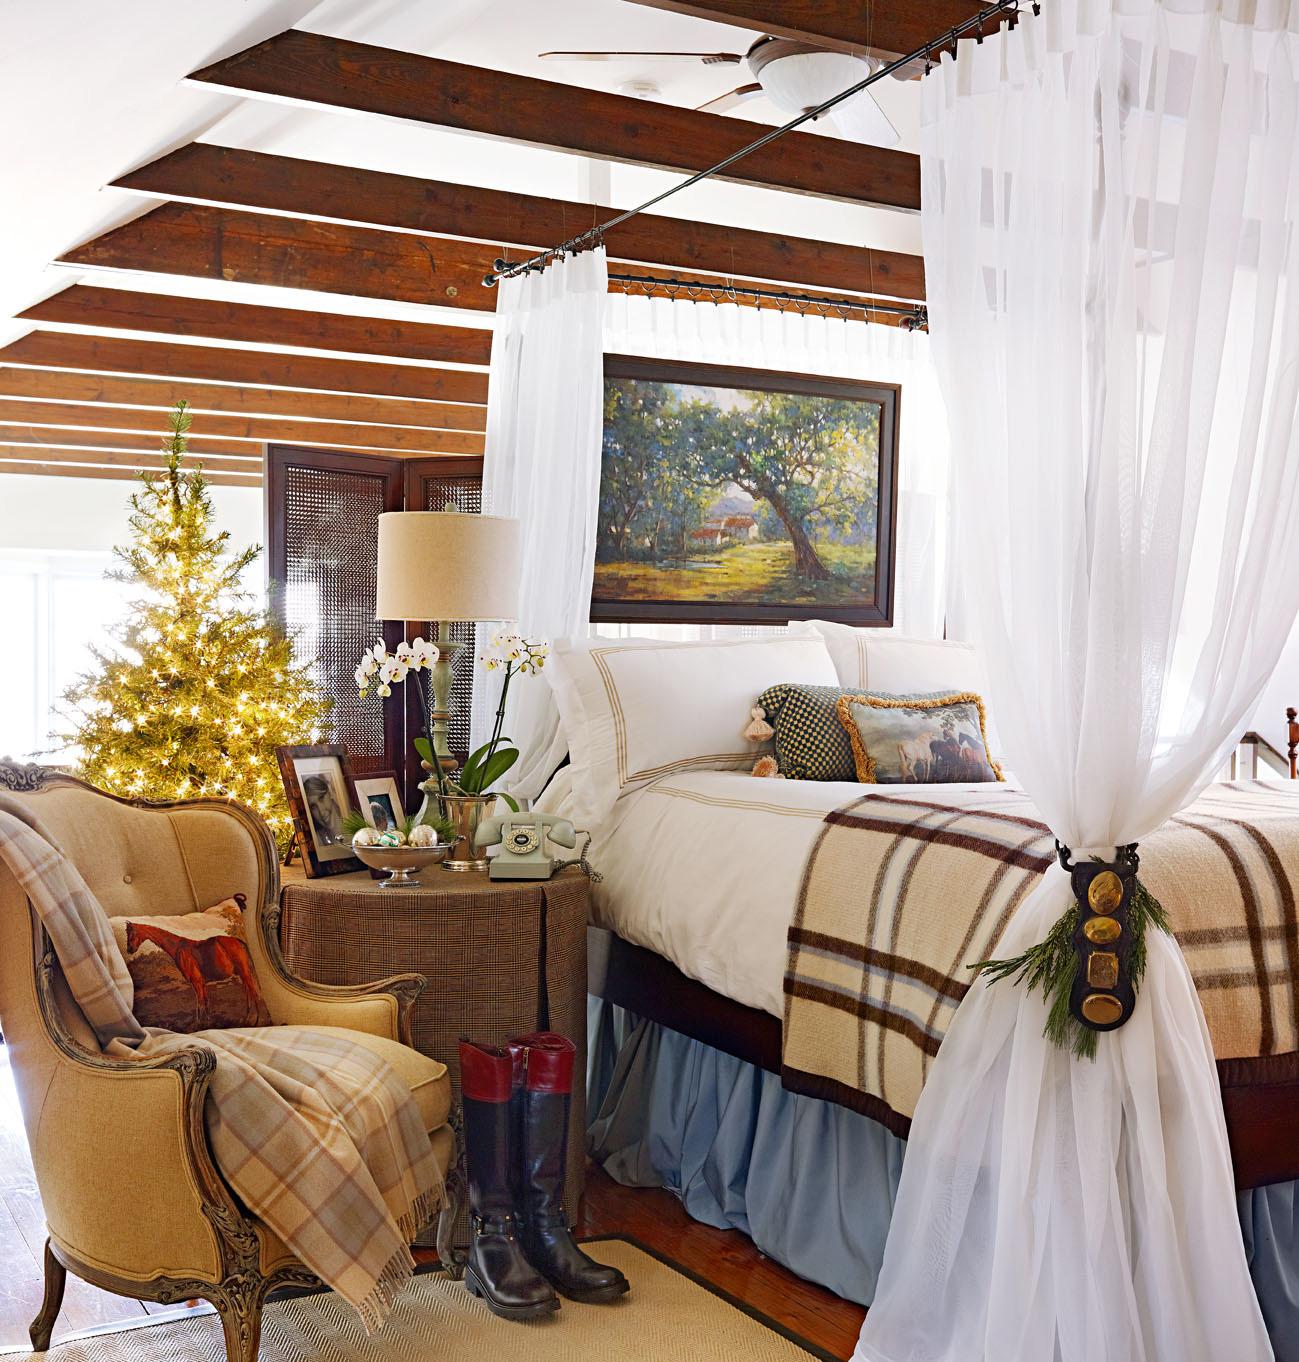 A barn bedroom